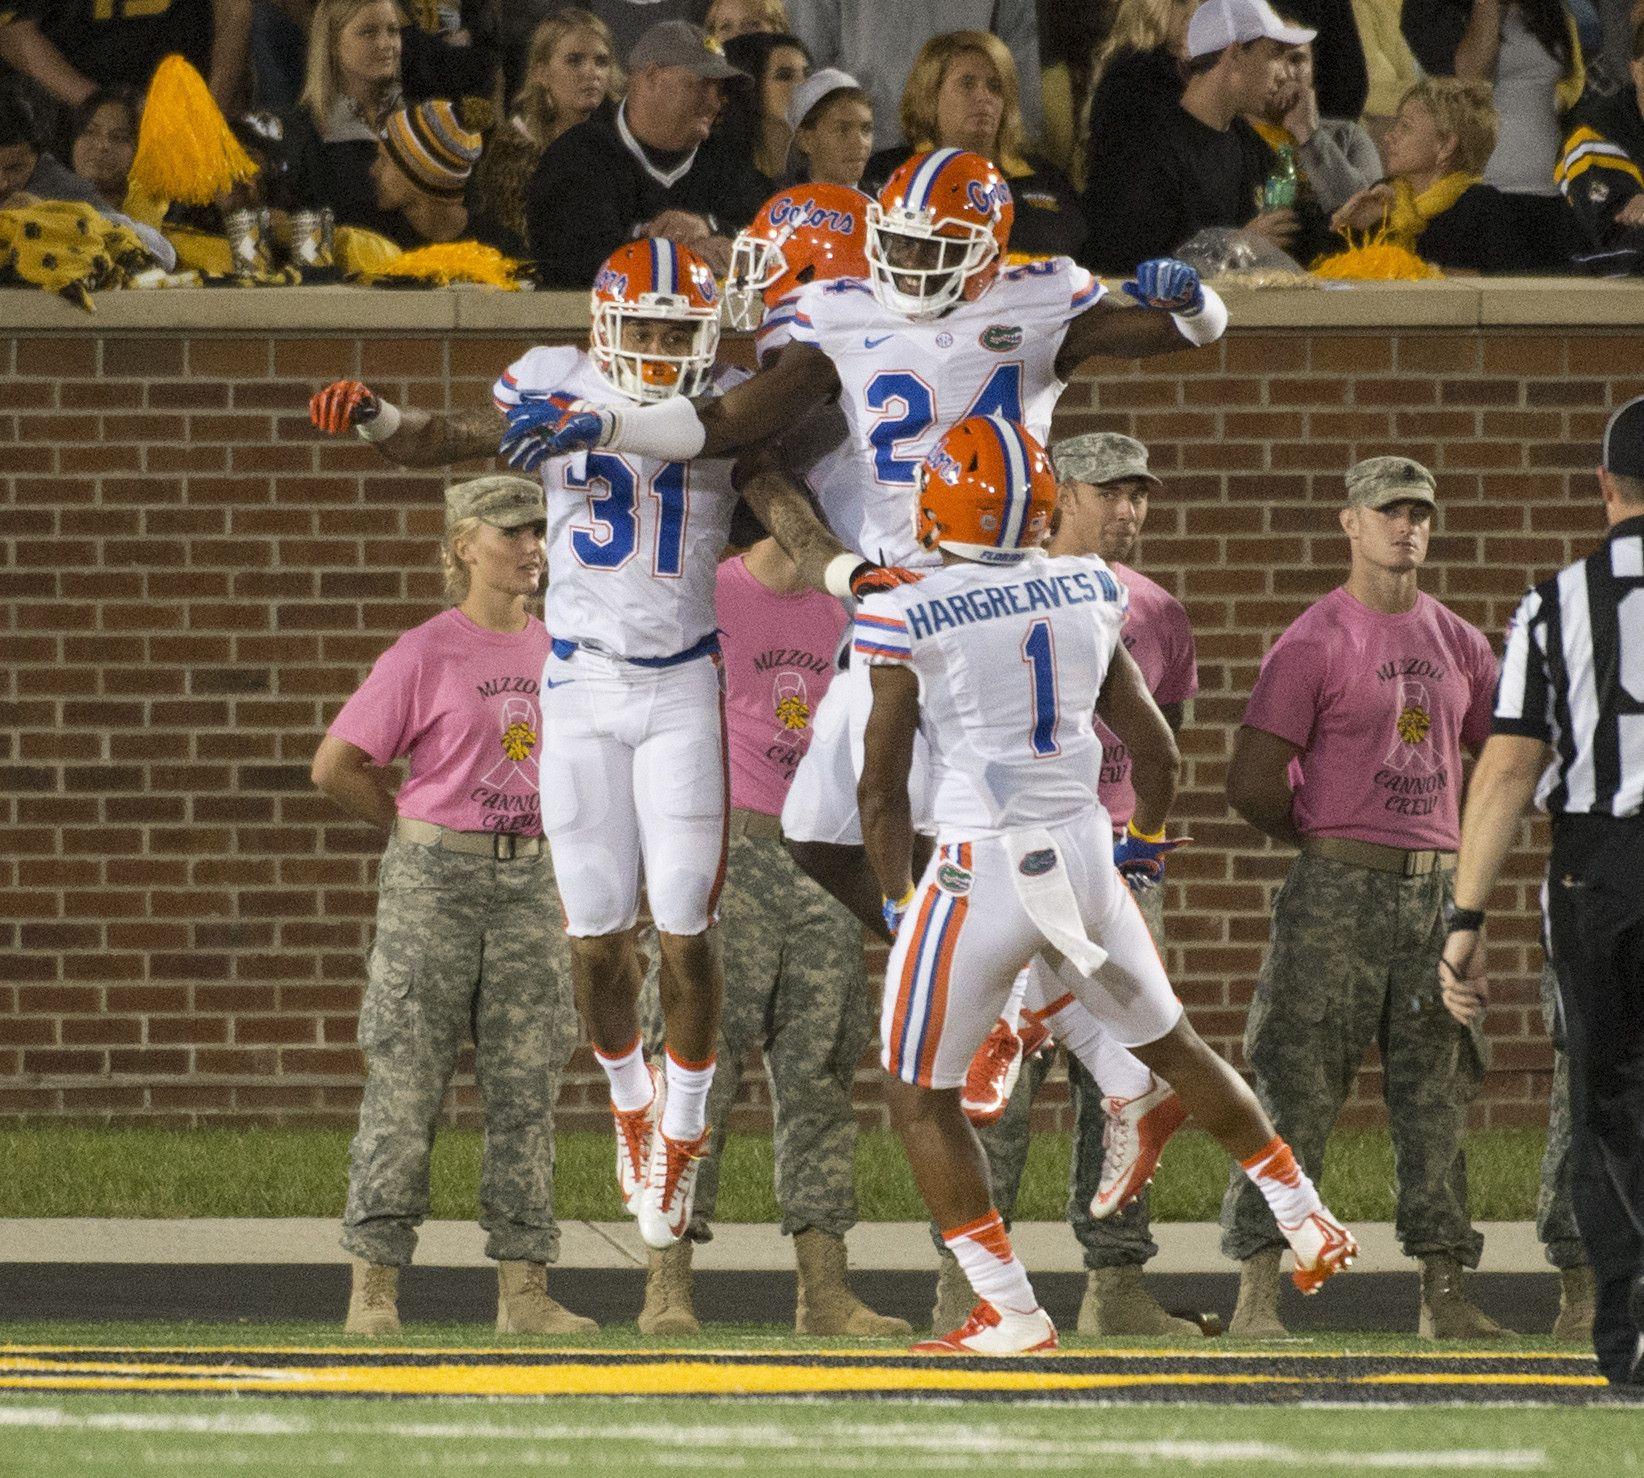 Unbeaten Gators Turn Attention To Heisman Frontrunner Fournette And Lsu Florida Gators Lsu Gators Football